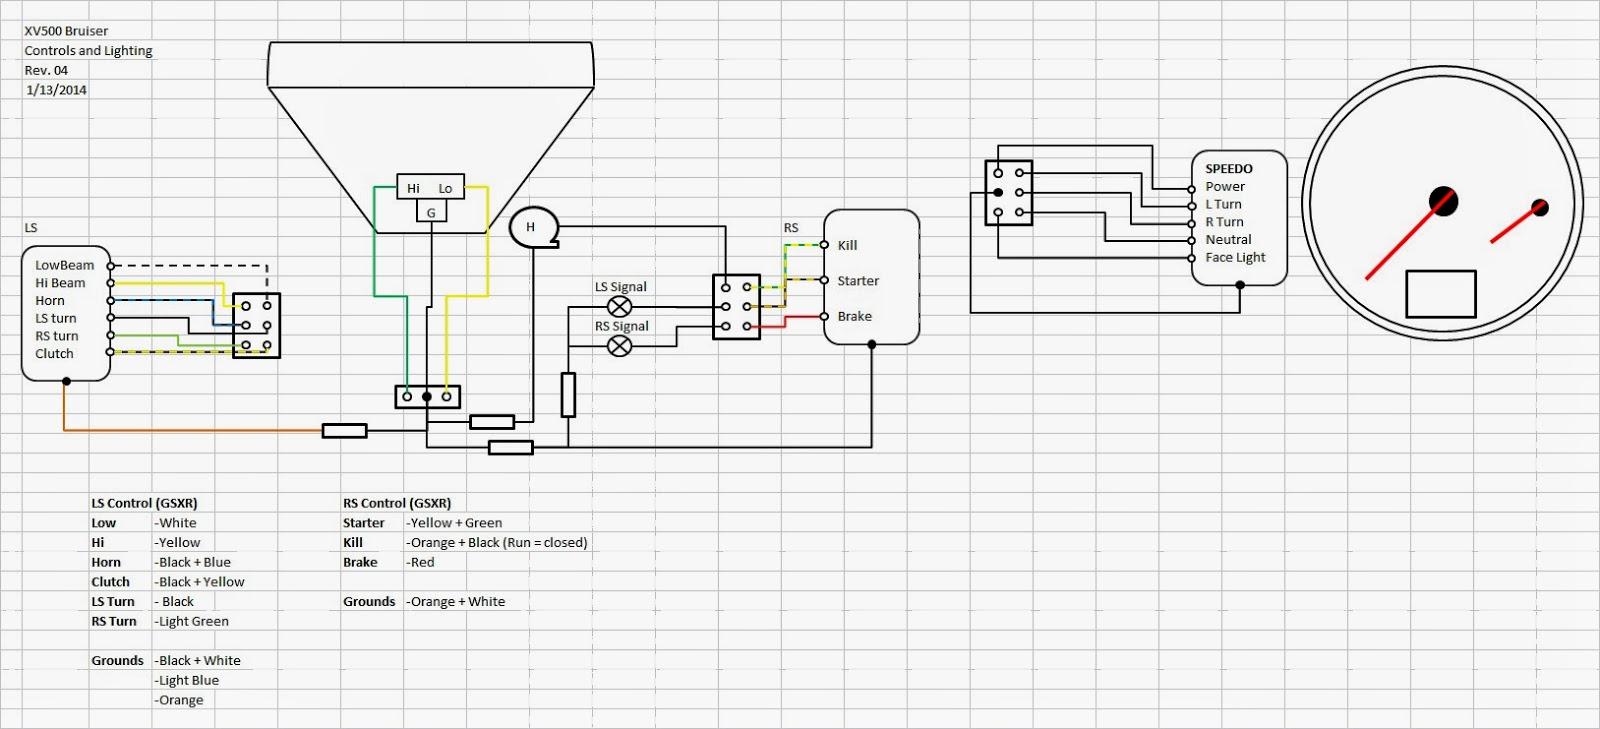 2007 suzuki hayabusa wiring diagram imageresizertool com [ 1600 x 729 Pixel ]